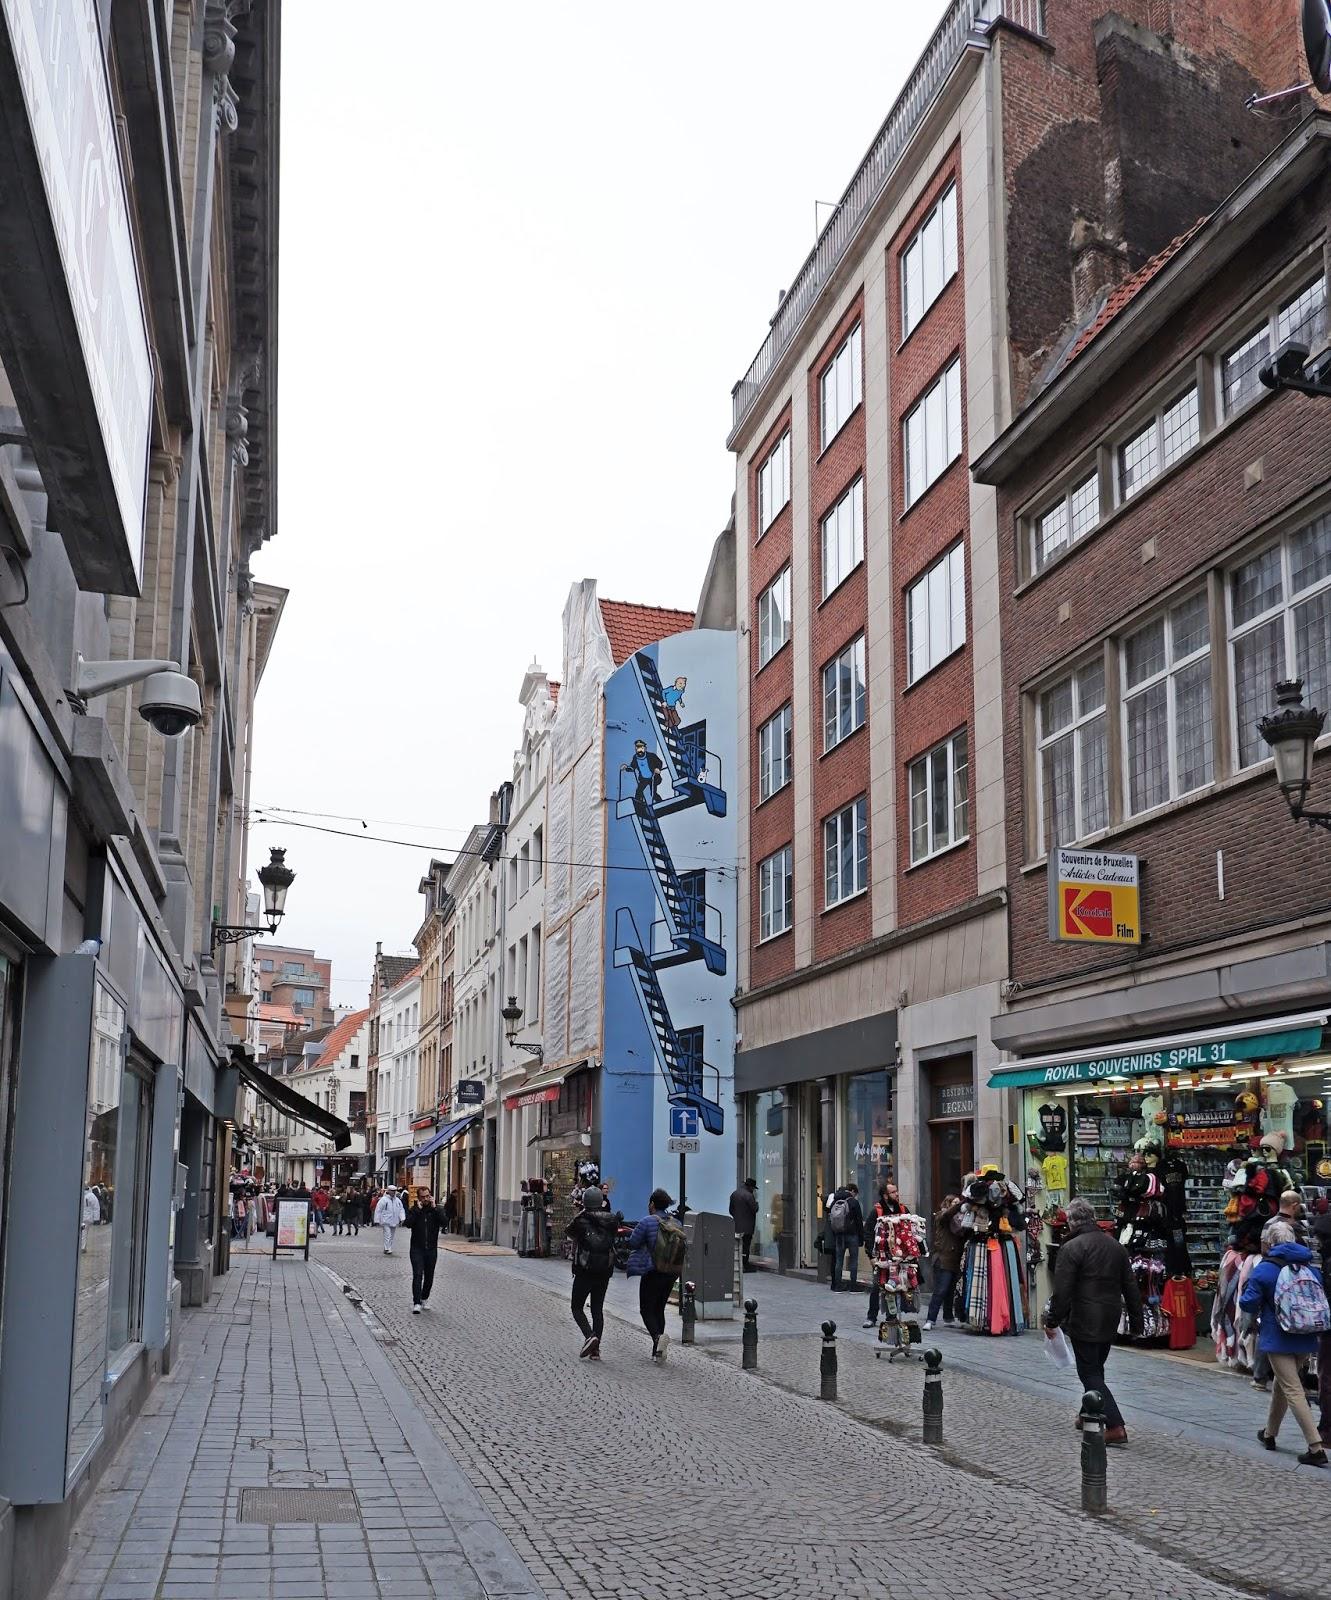 Tintin street art in Brussels, Belgium